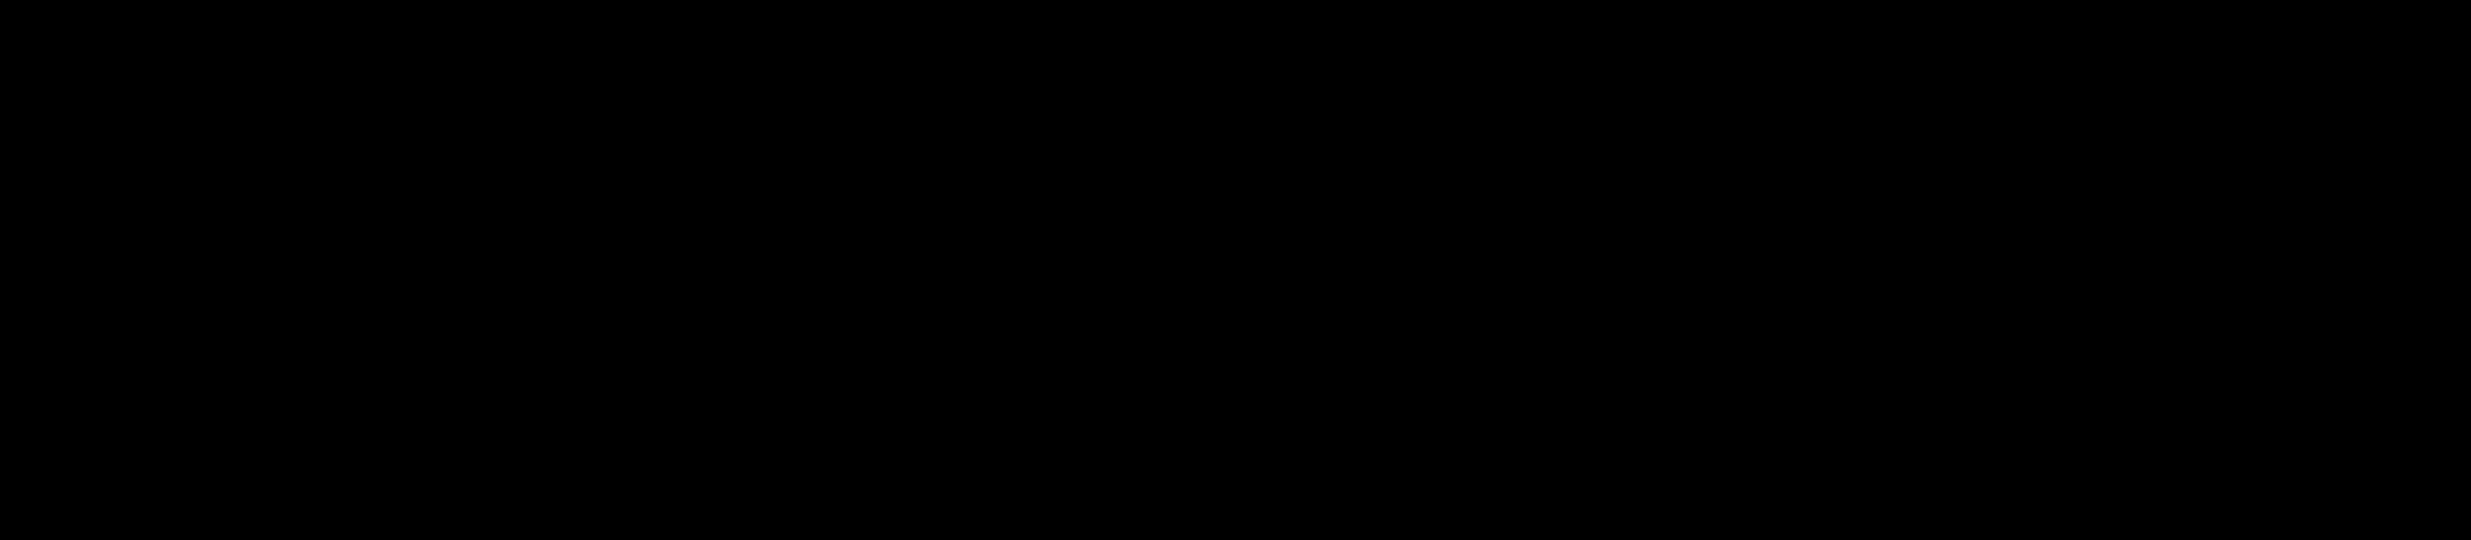 InLingua Logo Transparent Background